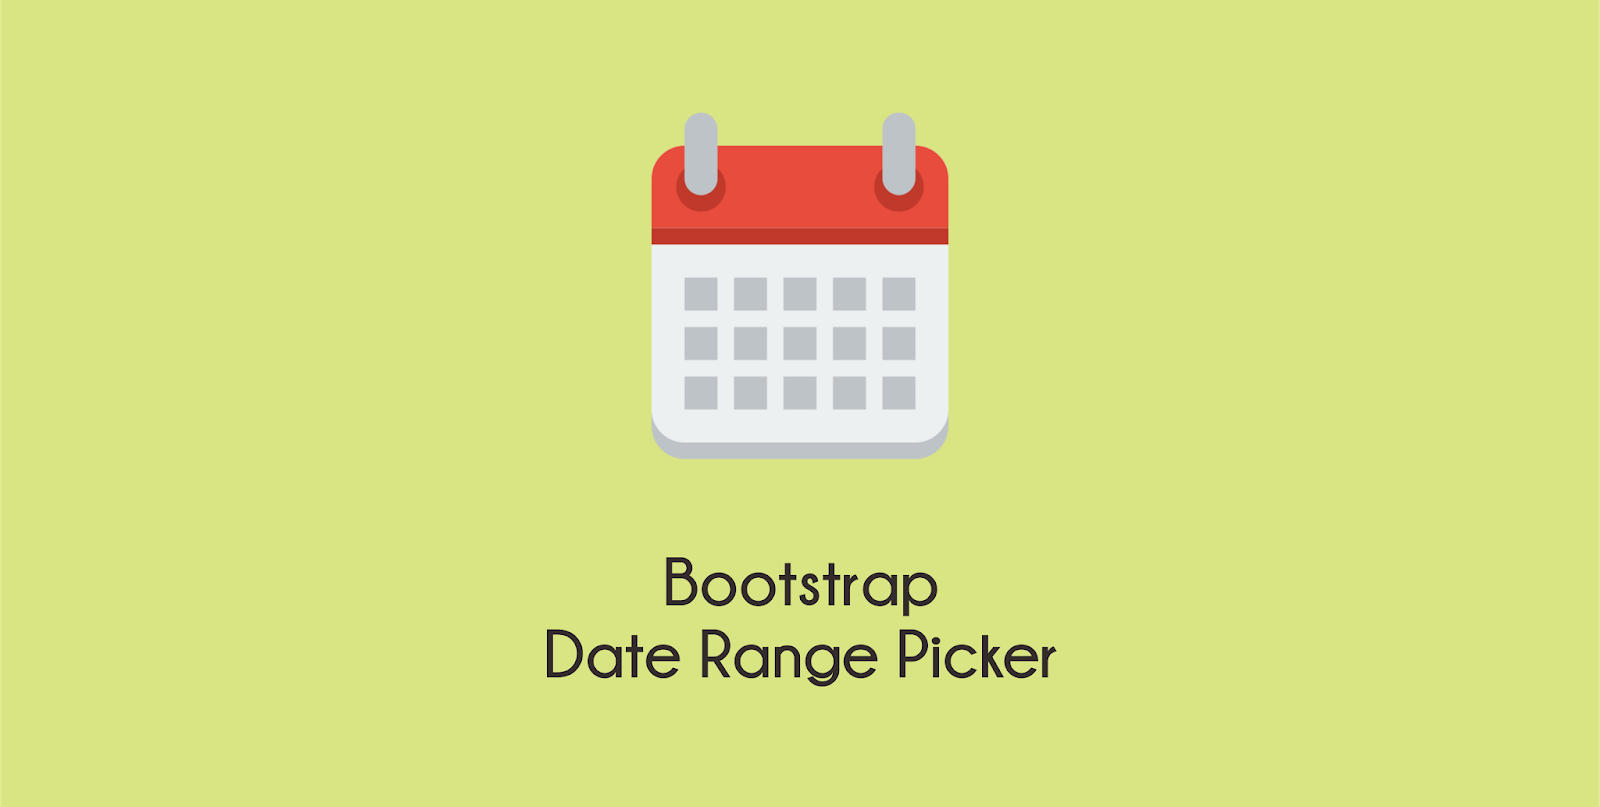 Using Bootstrap Daterange Picker - Coding Cheese